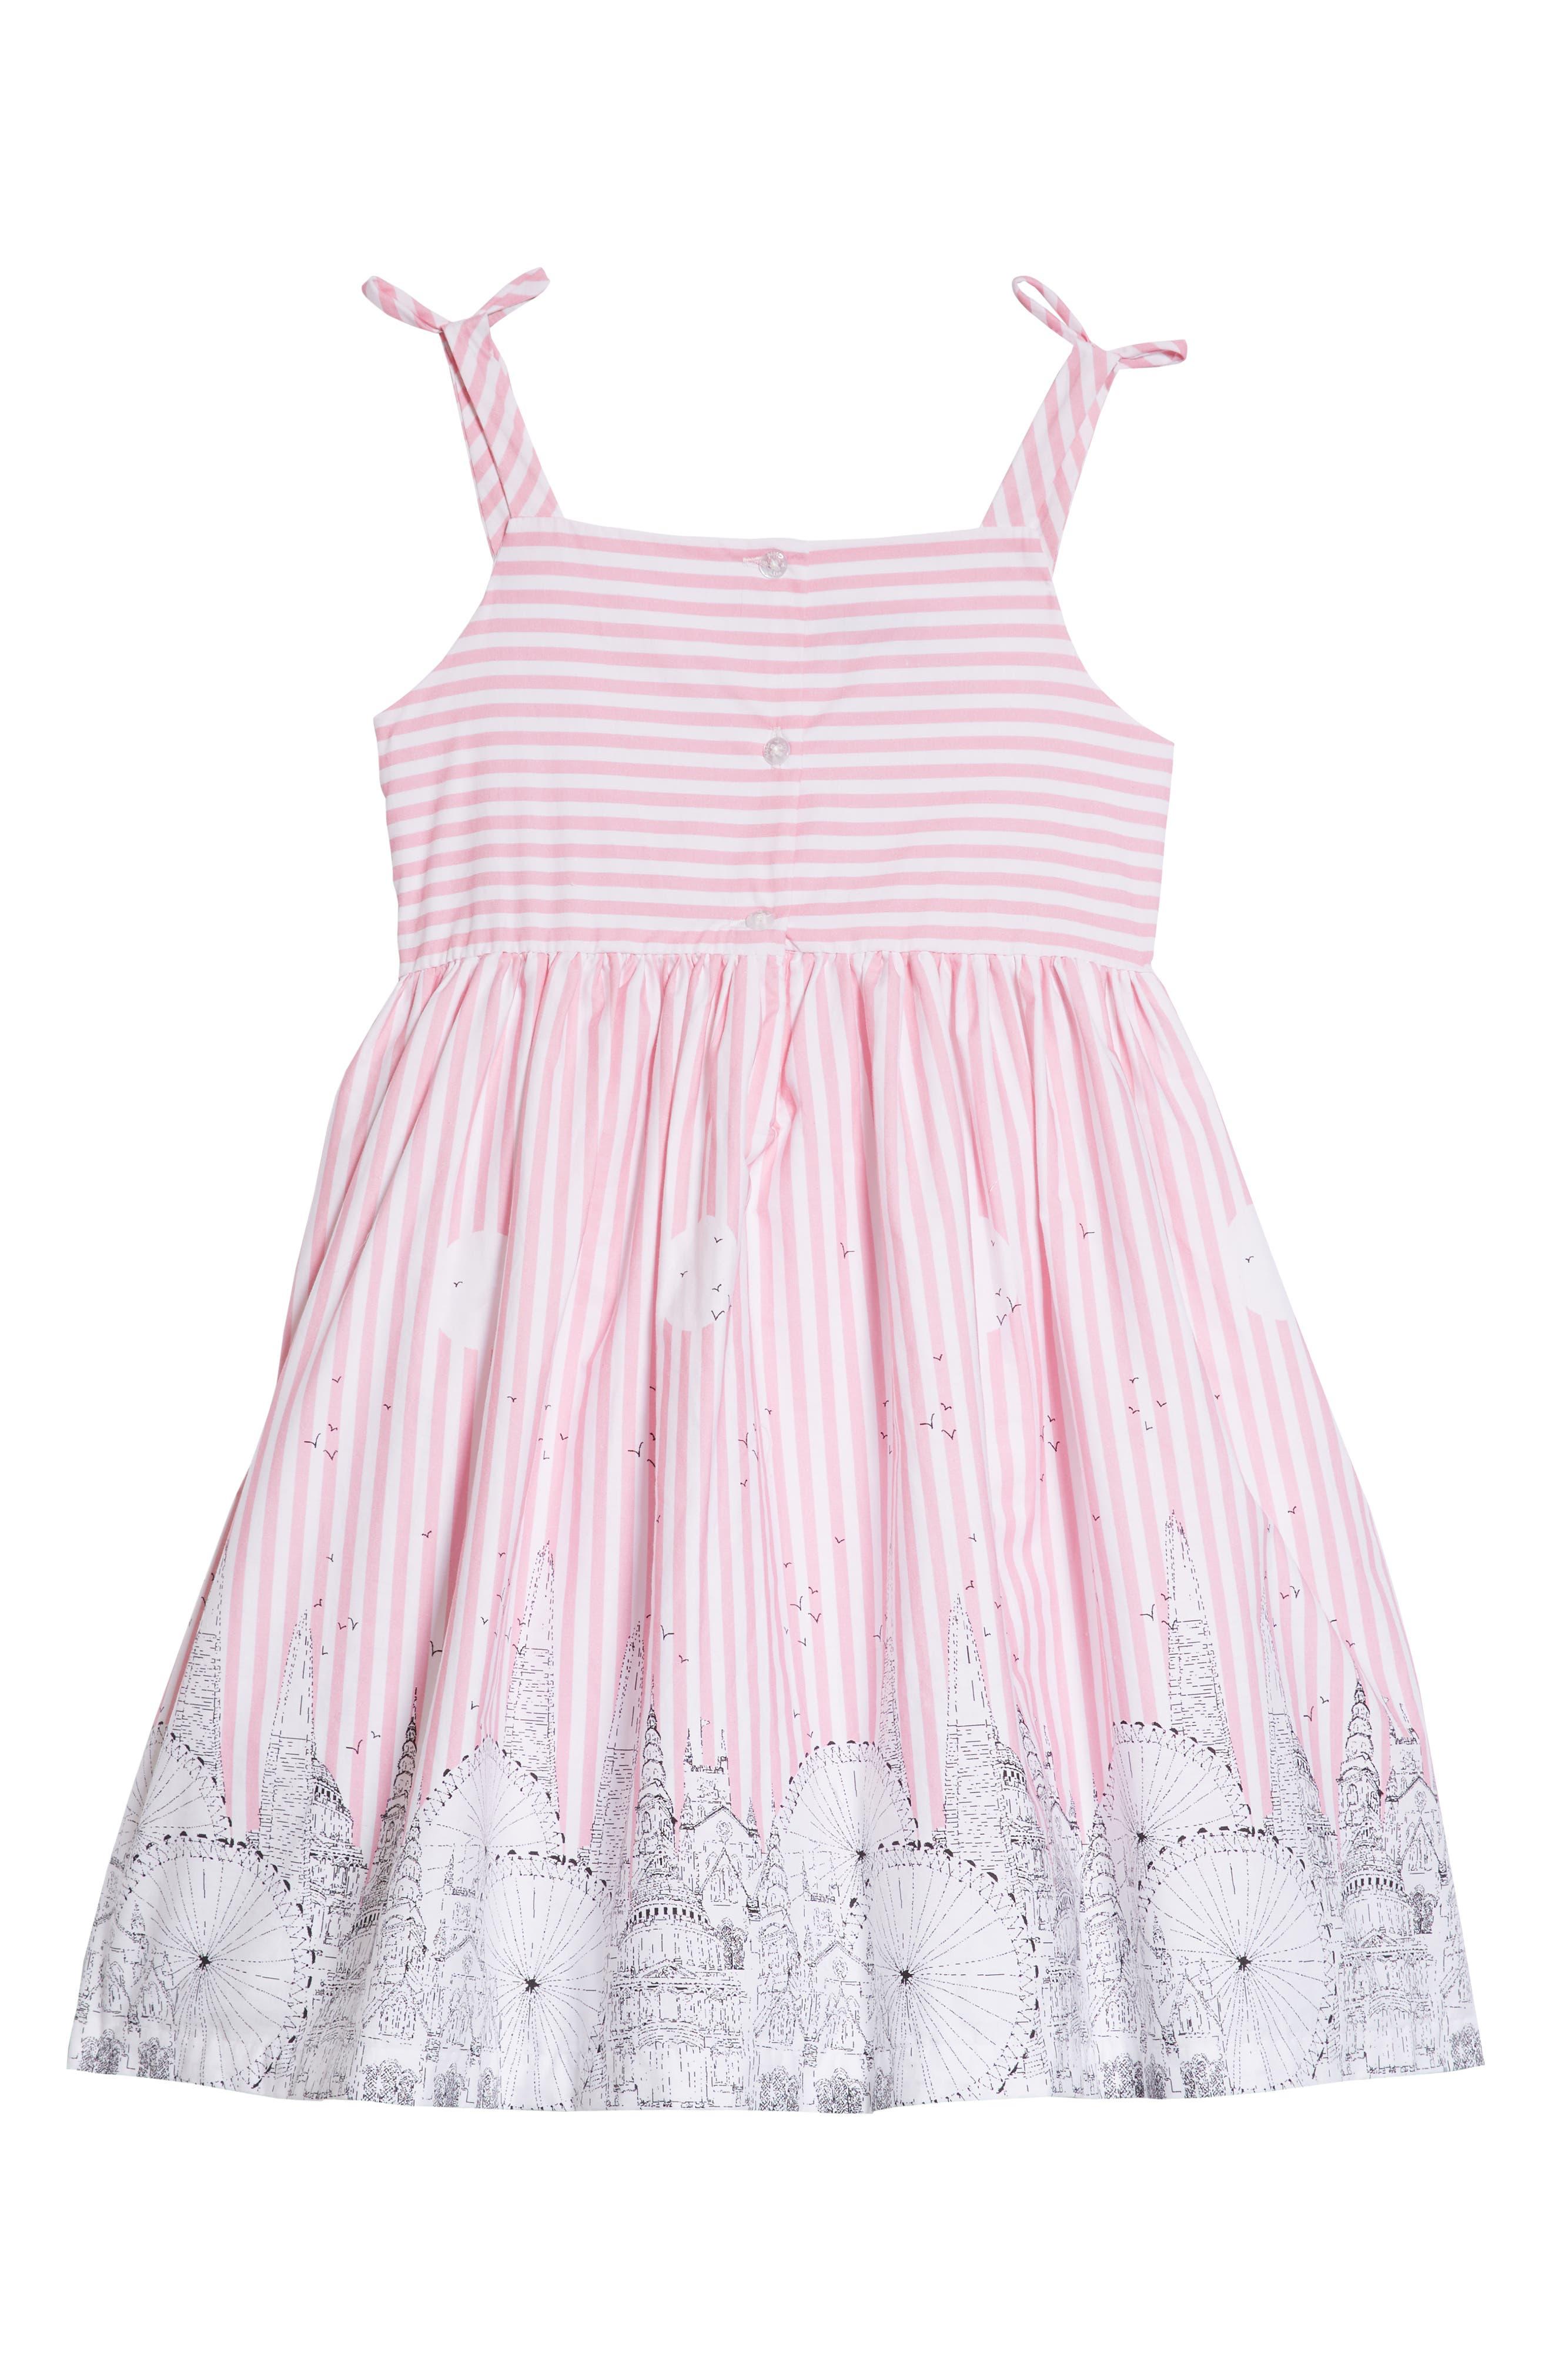 Cityscape Dress,                             Alternate thumbnail 2, color,                             Pink/ White